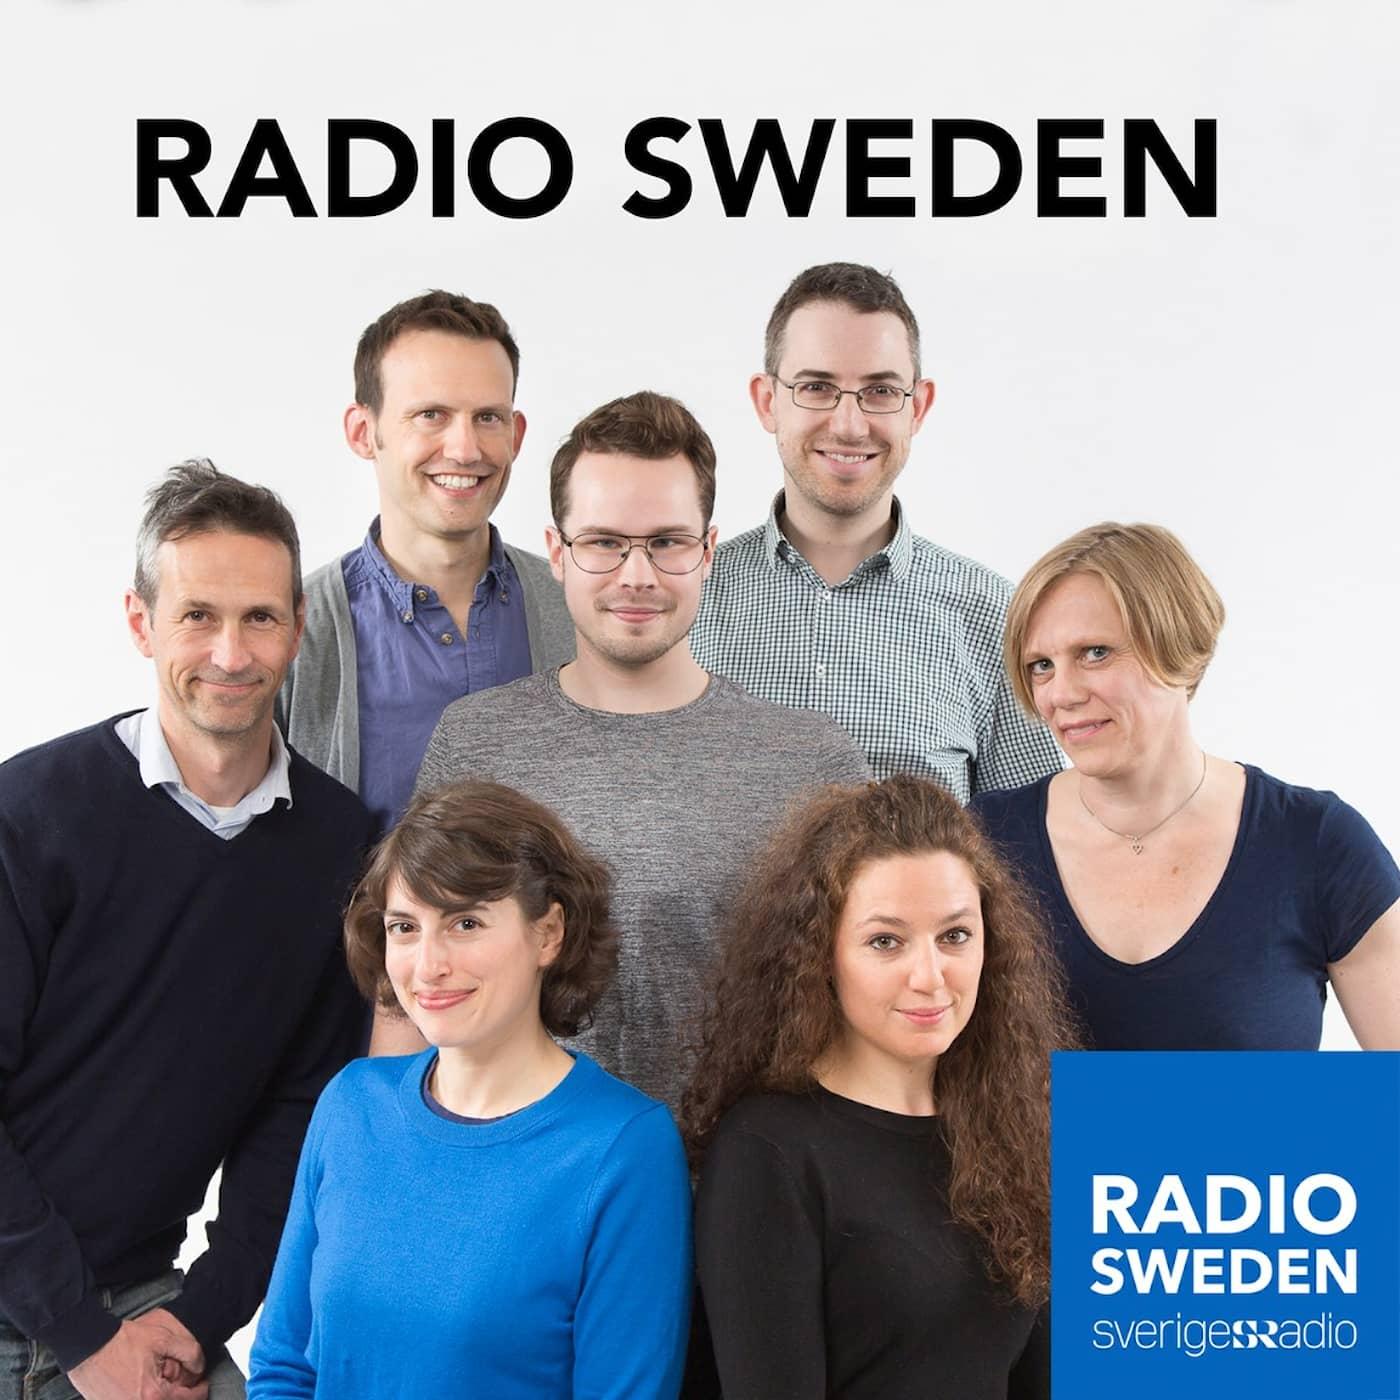 Radio Sweden - Swedish news in English